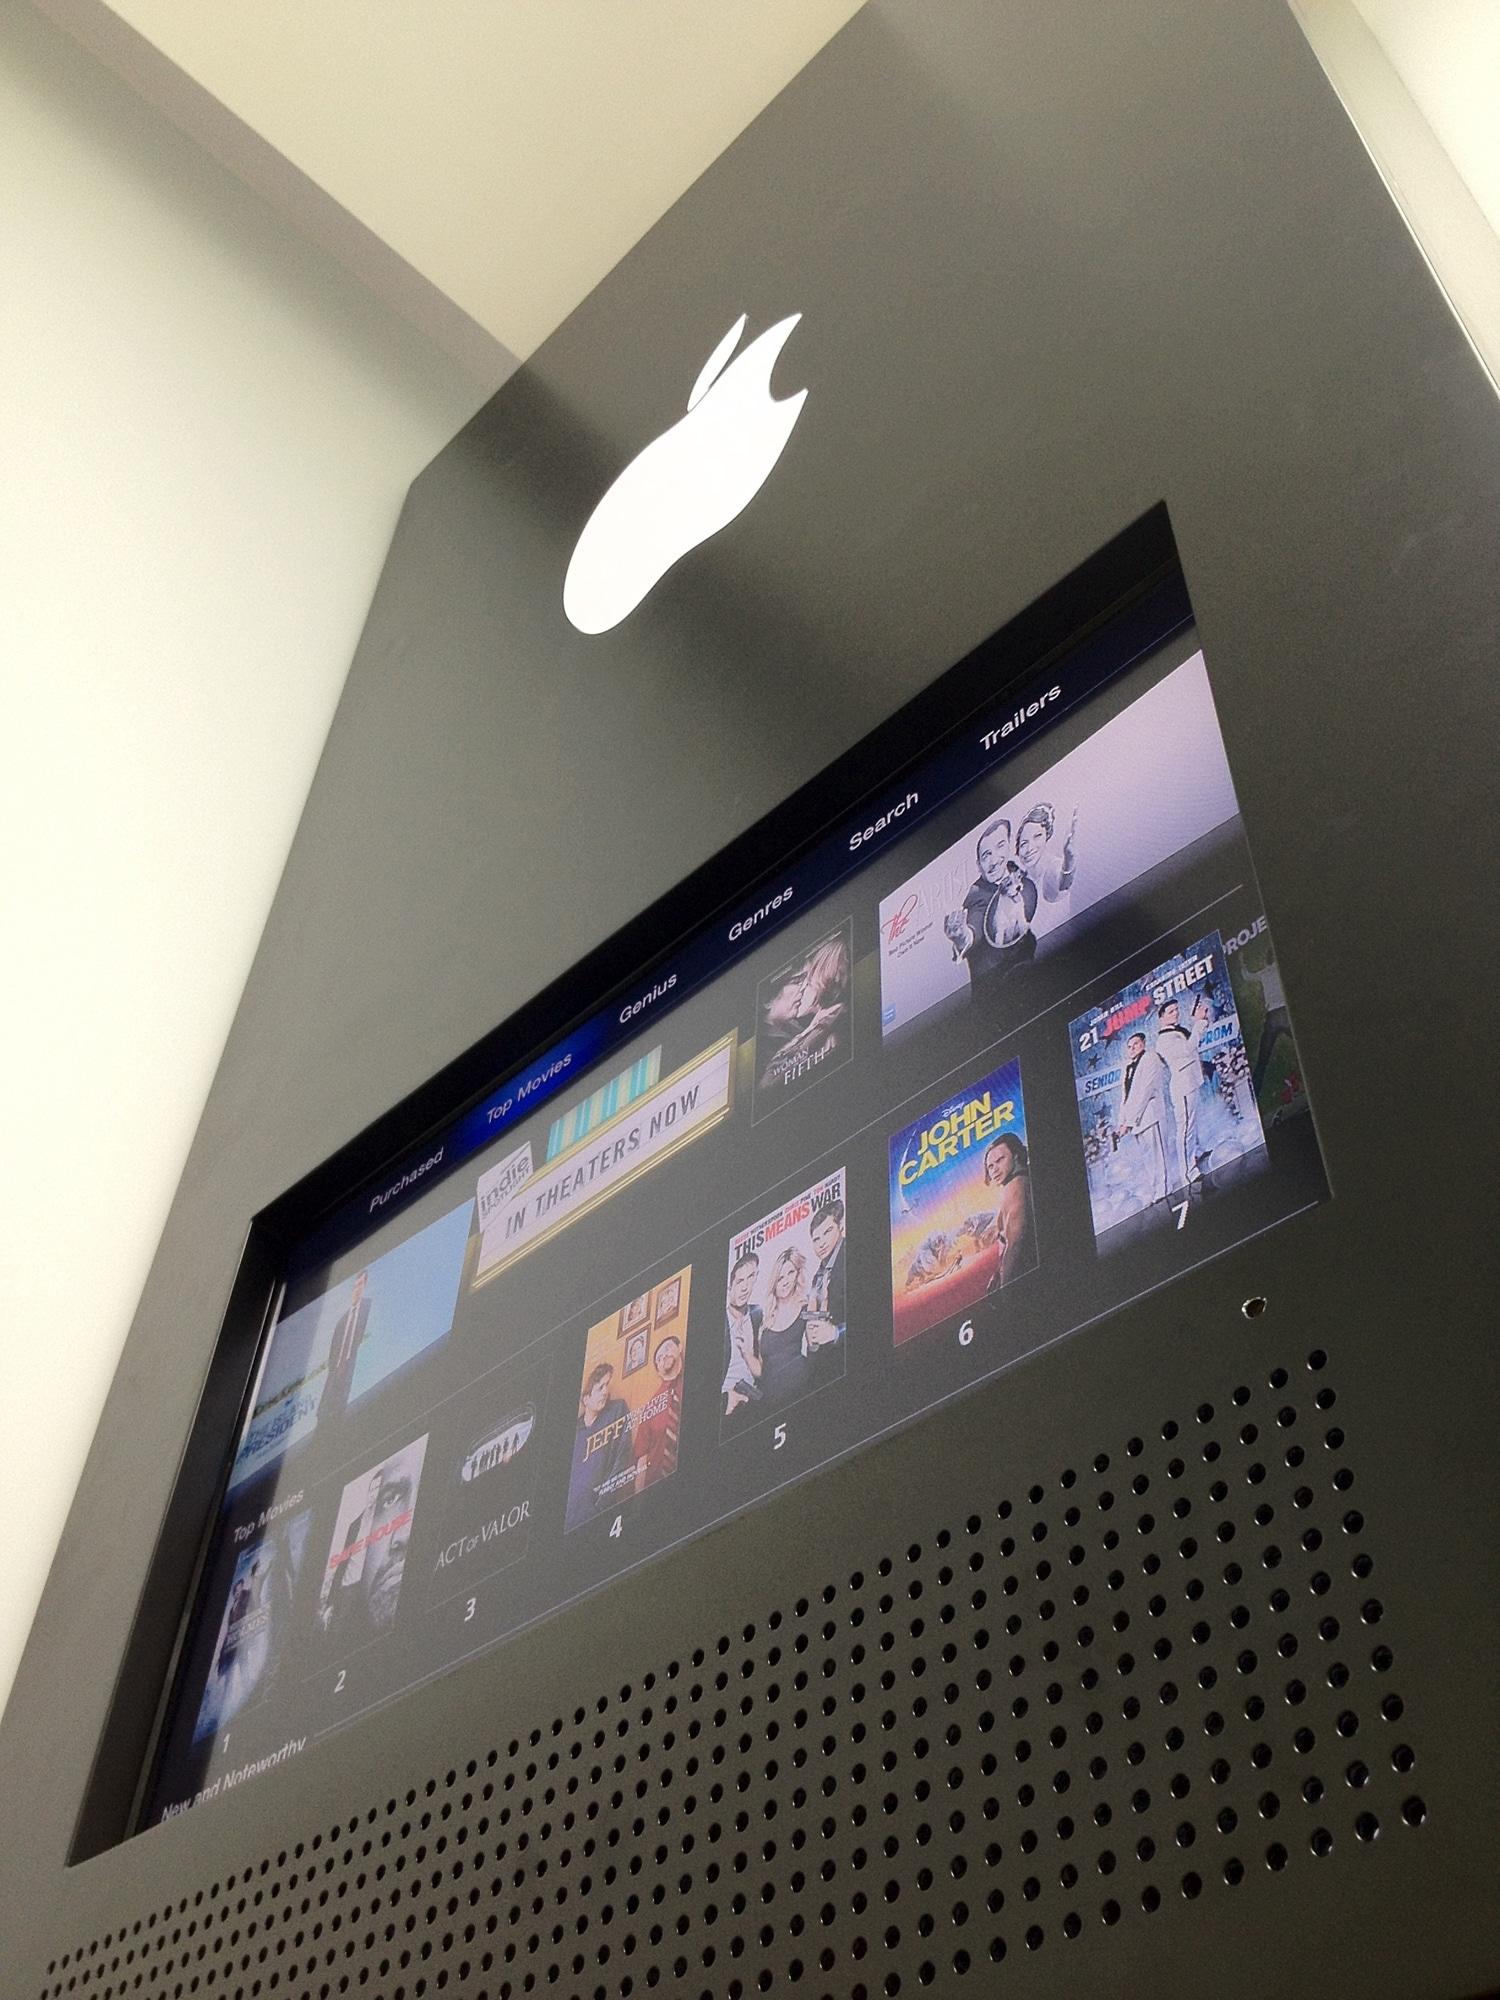 An Insane Apple Store Inspired Home Office Design